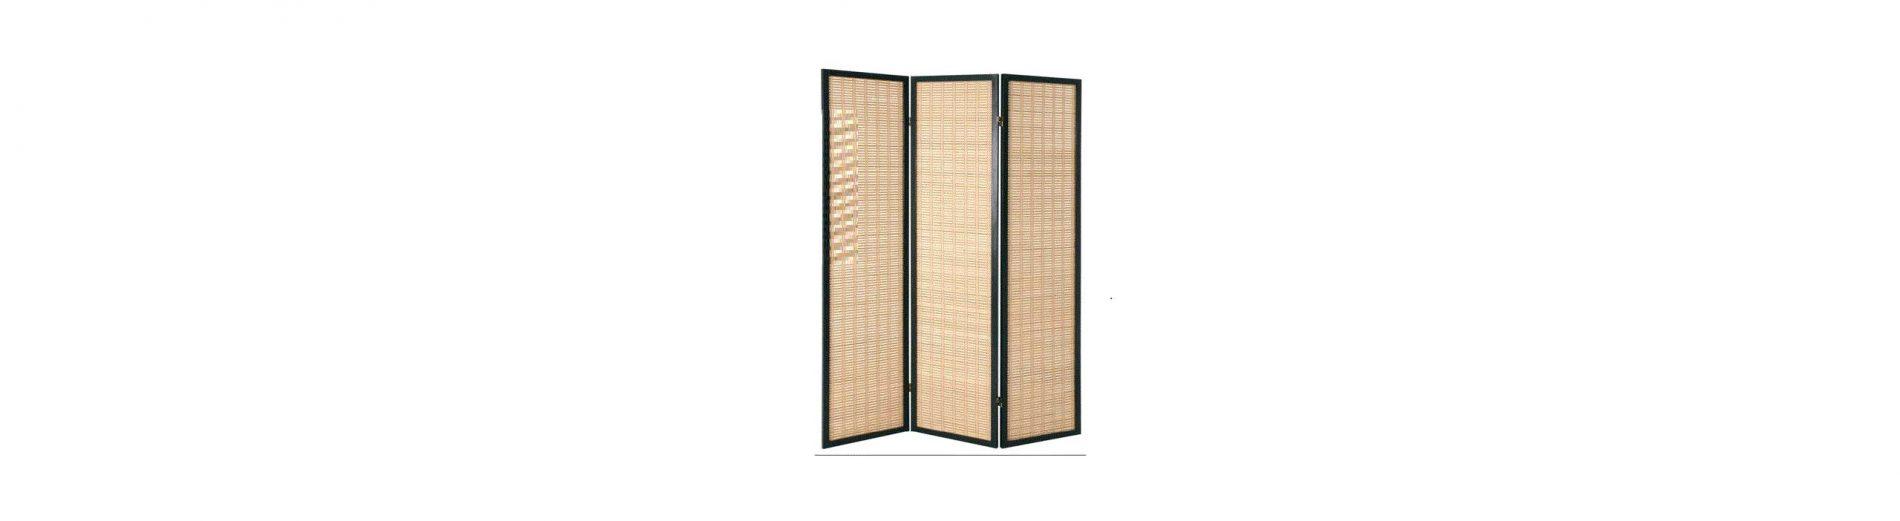 7 Bamboo Furniture Ideas For Stylish Interiors